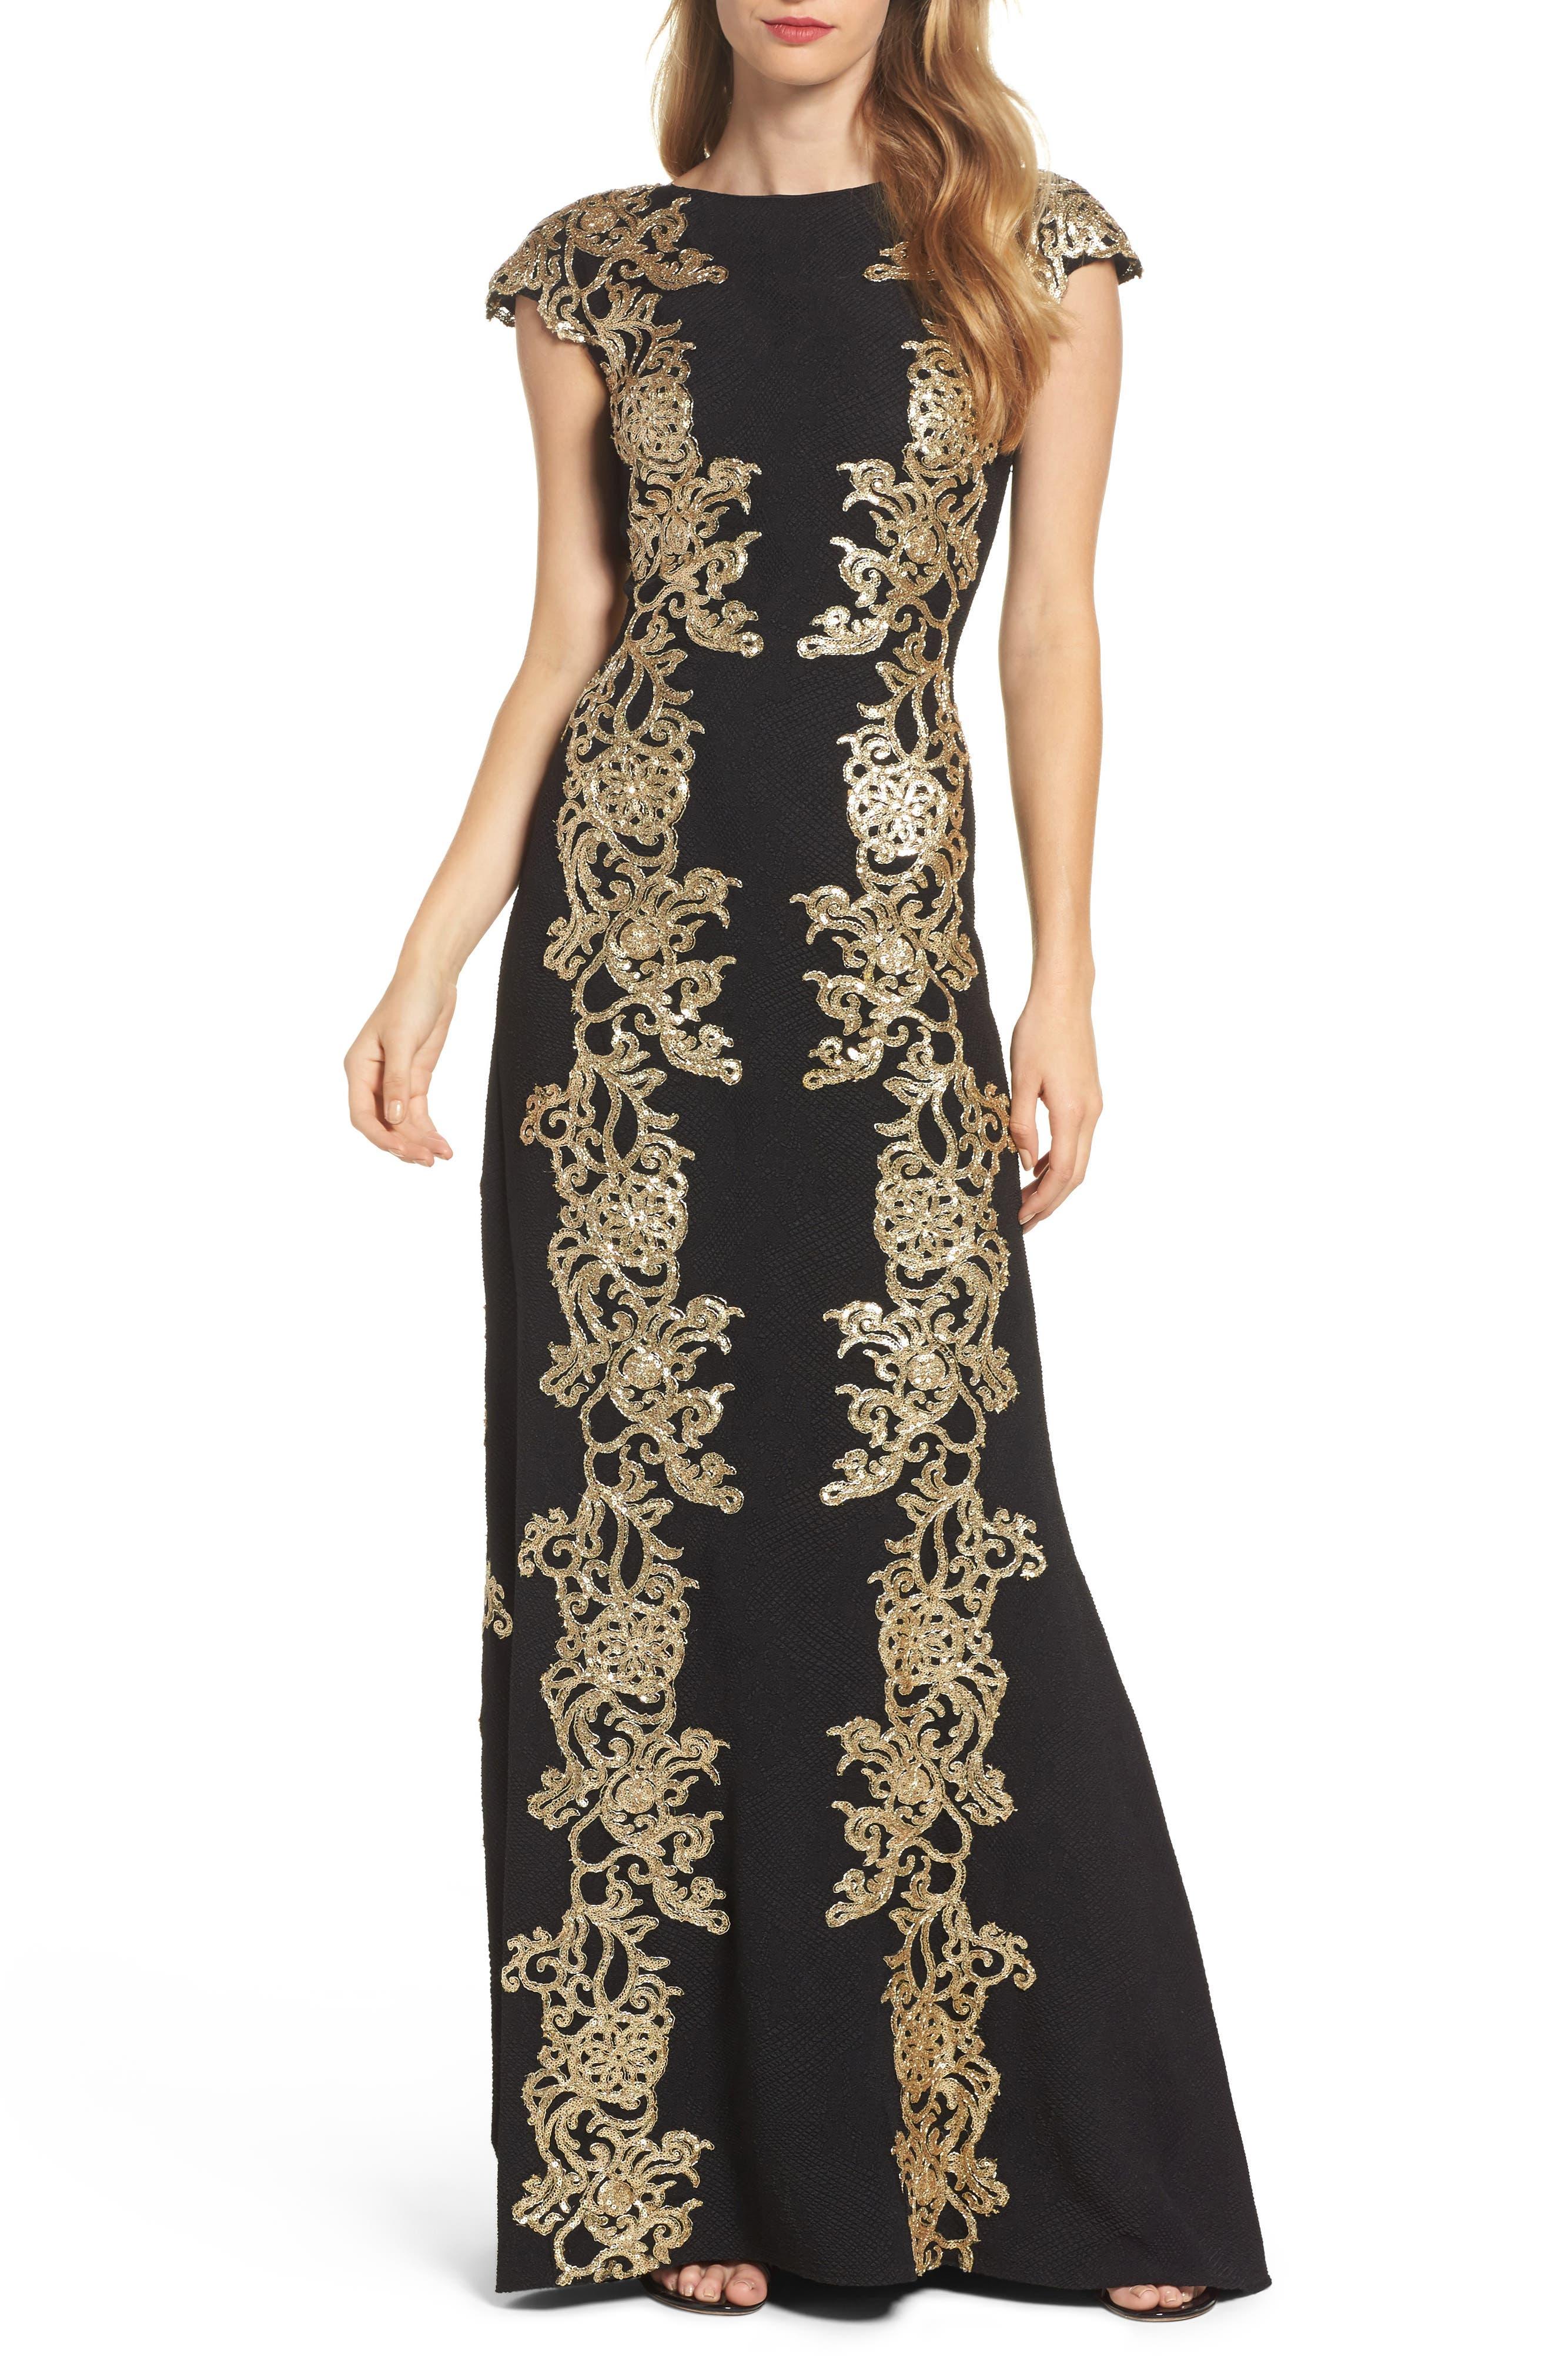 Tadashi Shoji Sequin Appliqué Textured Crepe Gown